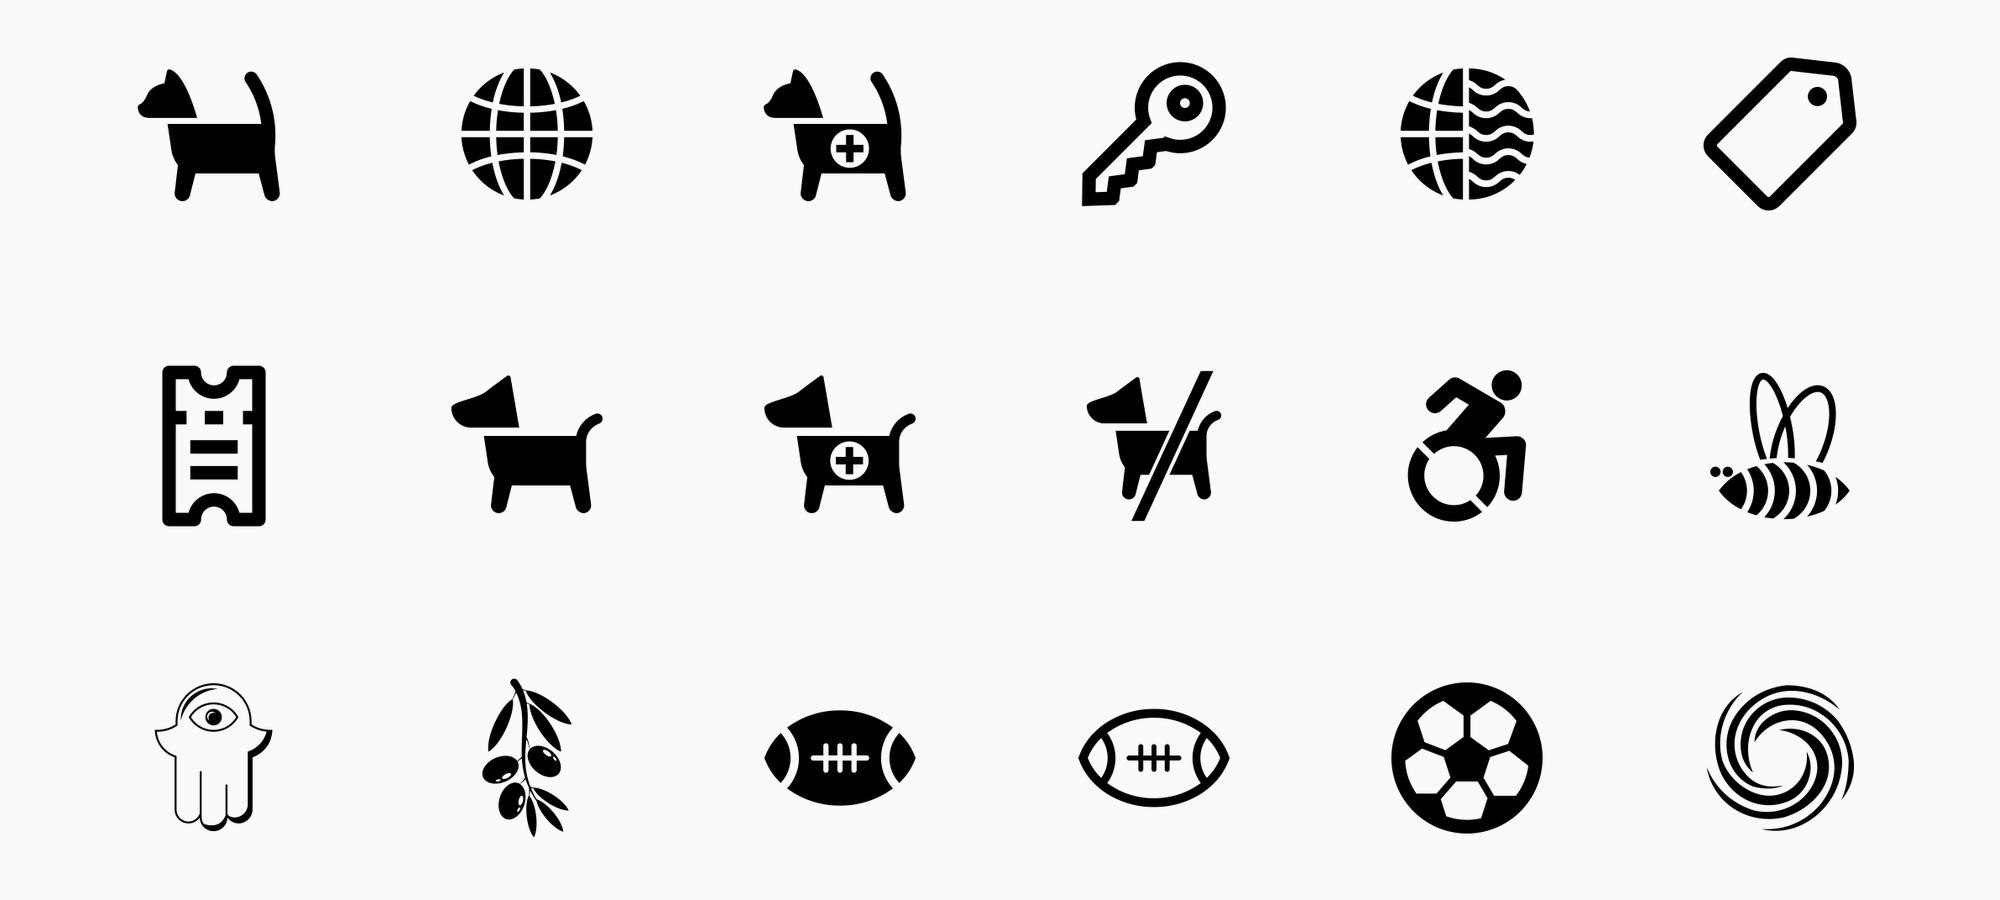 noun project glyph icons